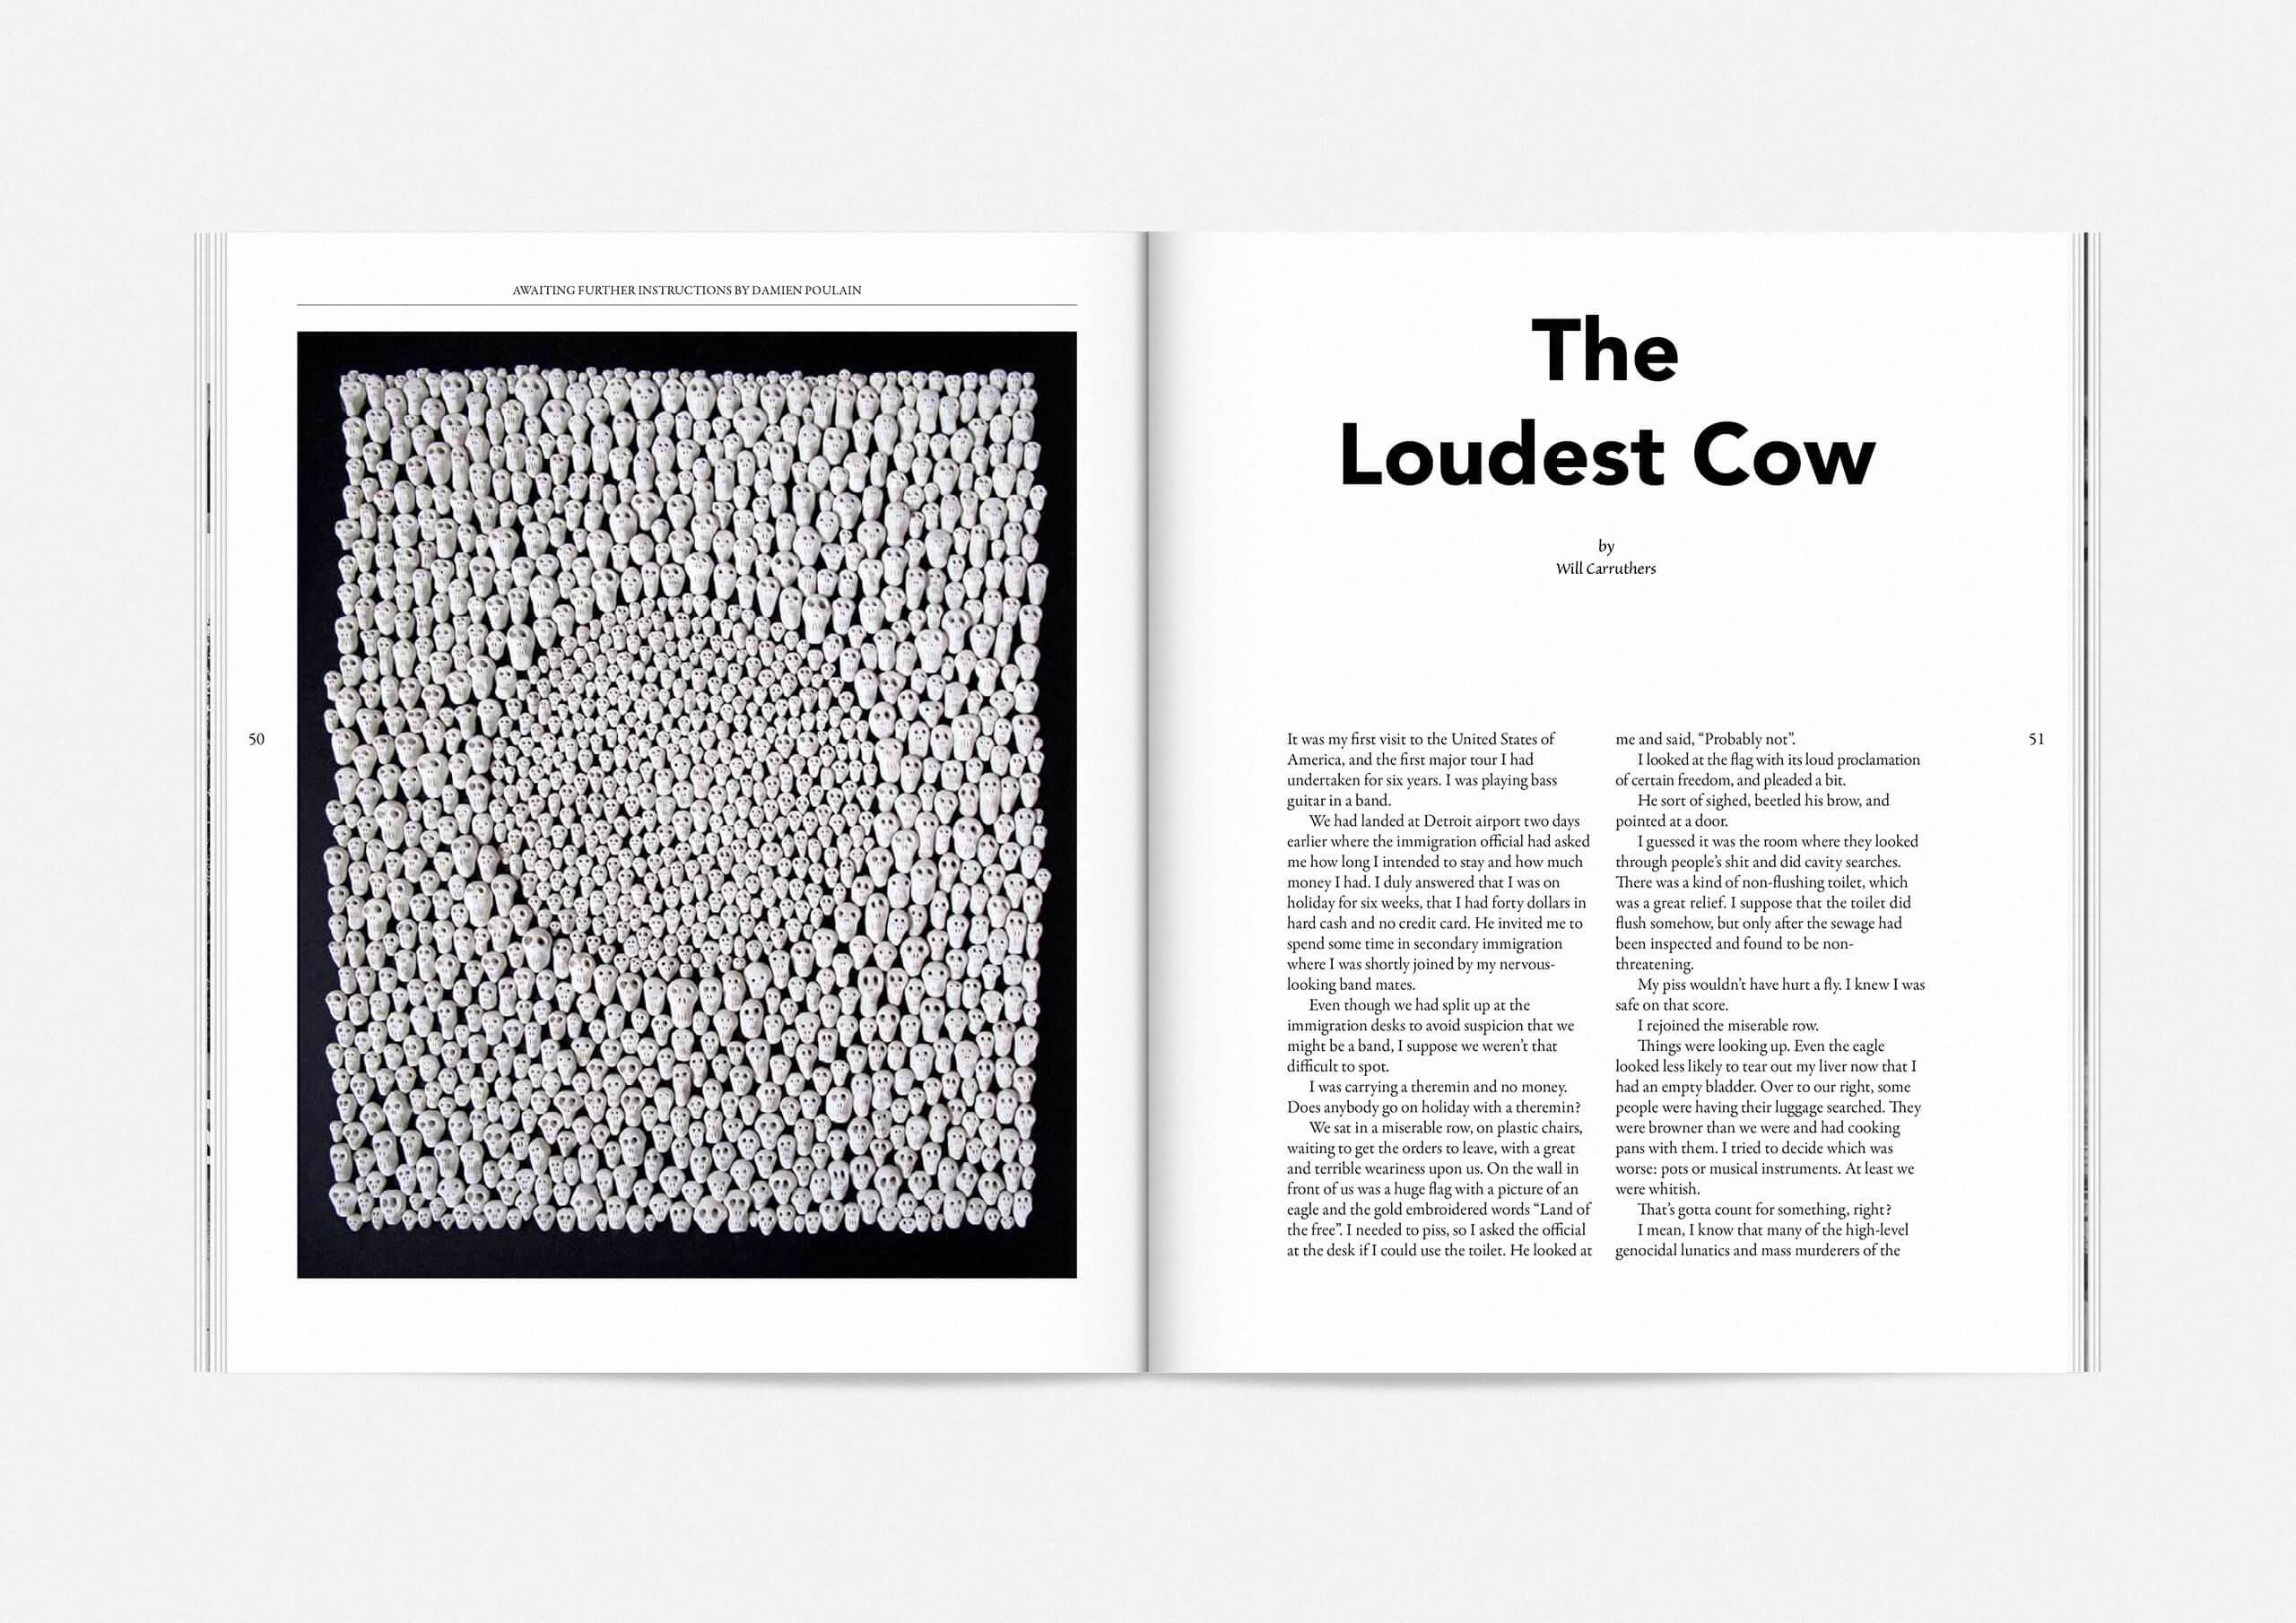 https://neuegestaltung.de/media/pages/clients/teller-magazine-issue-1/fec871db9e-1597415429/teller_issue_01_innenseite_50_51_ng.jpg